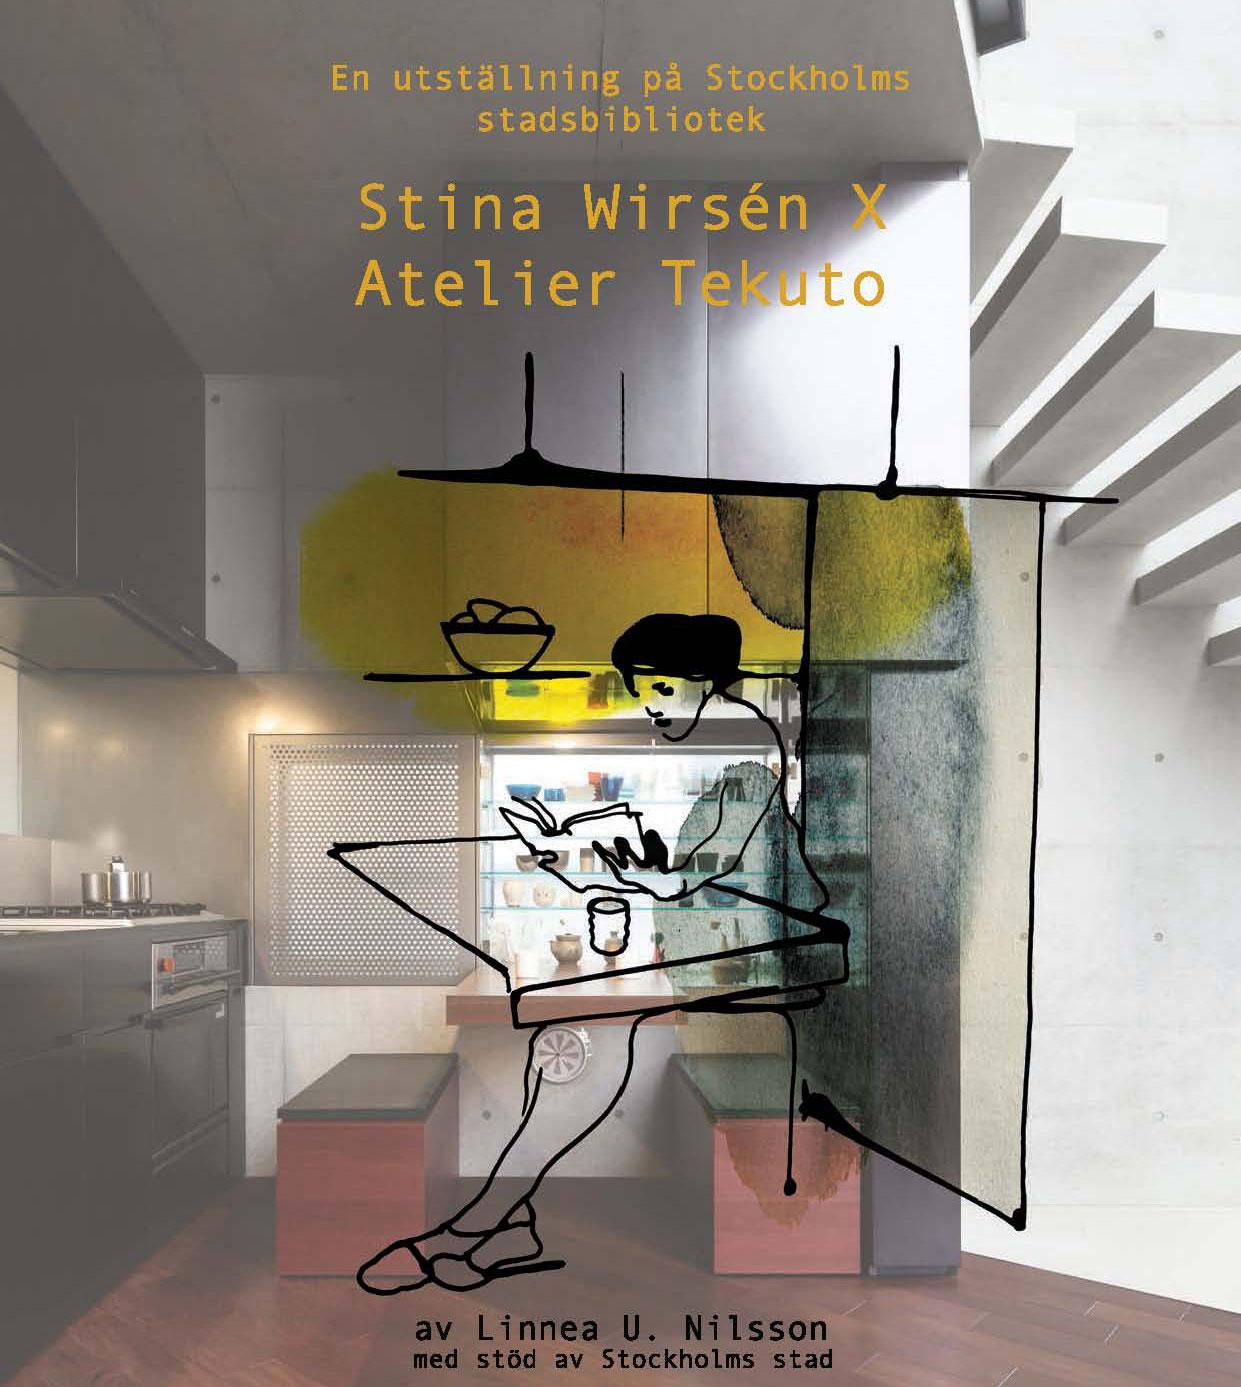 Exhibition-Poster-2.jpg